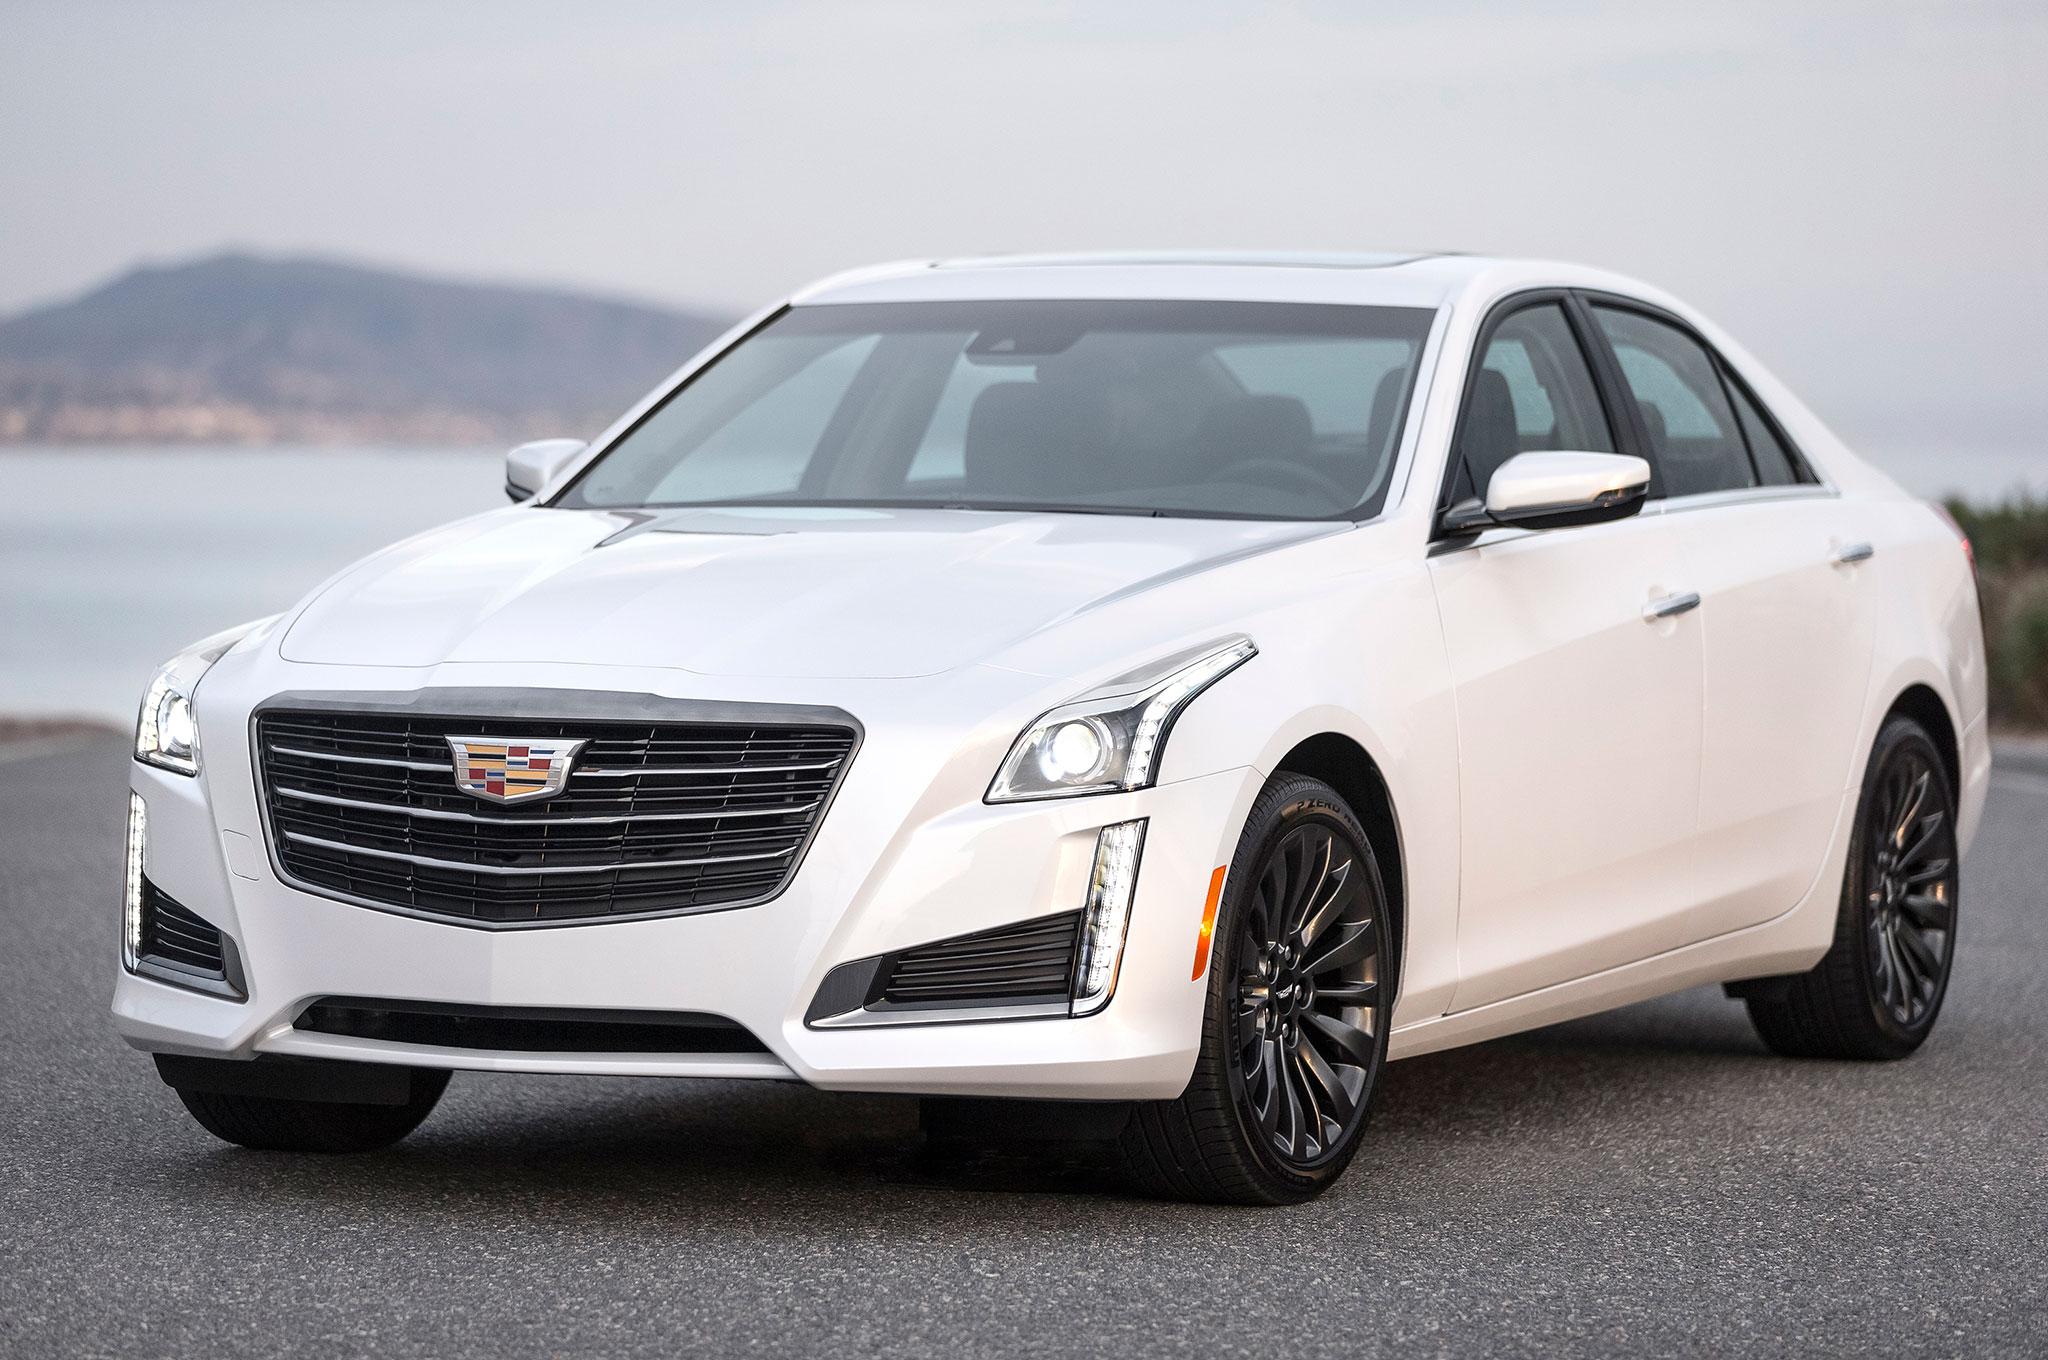 Cadillac Cts Black Chrome Front Three Quarter